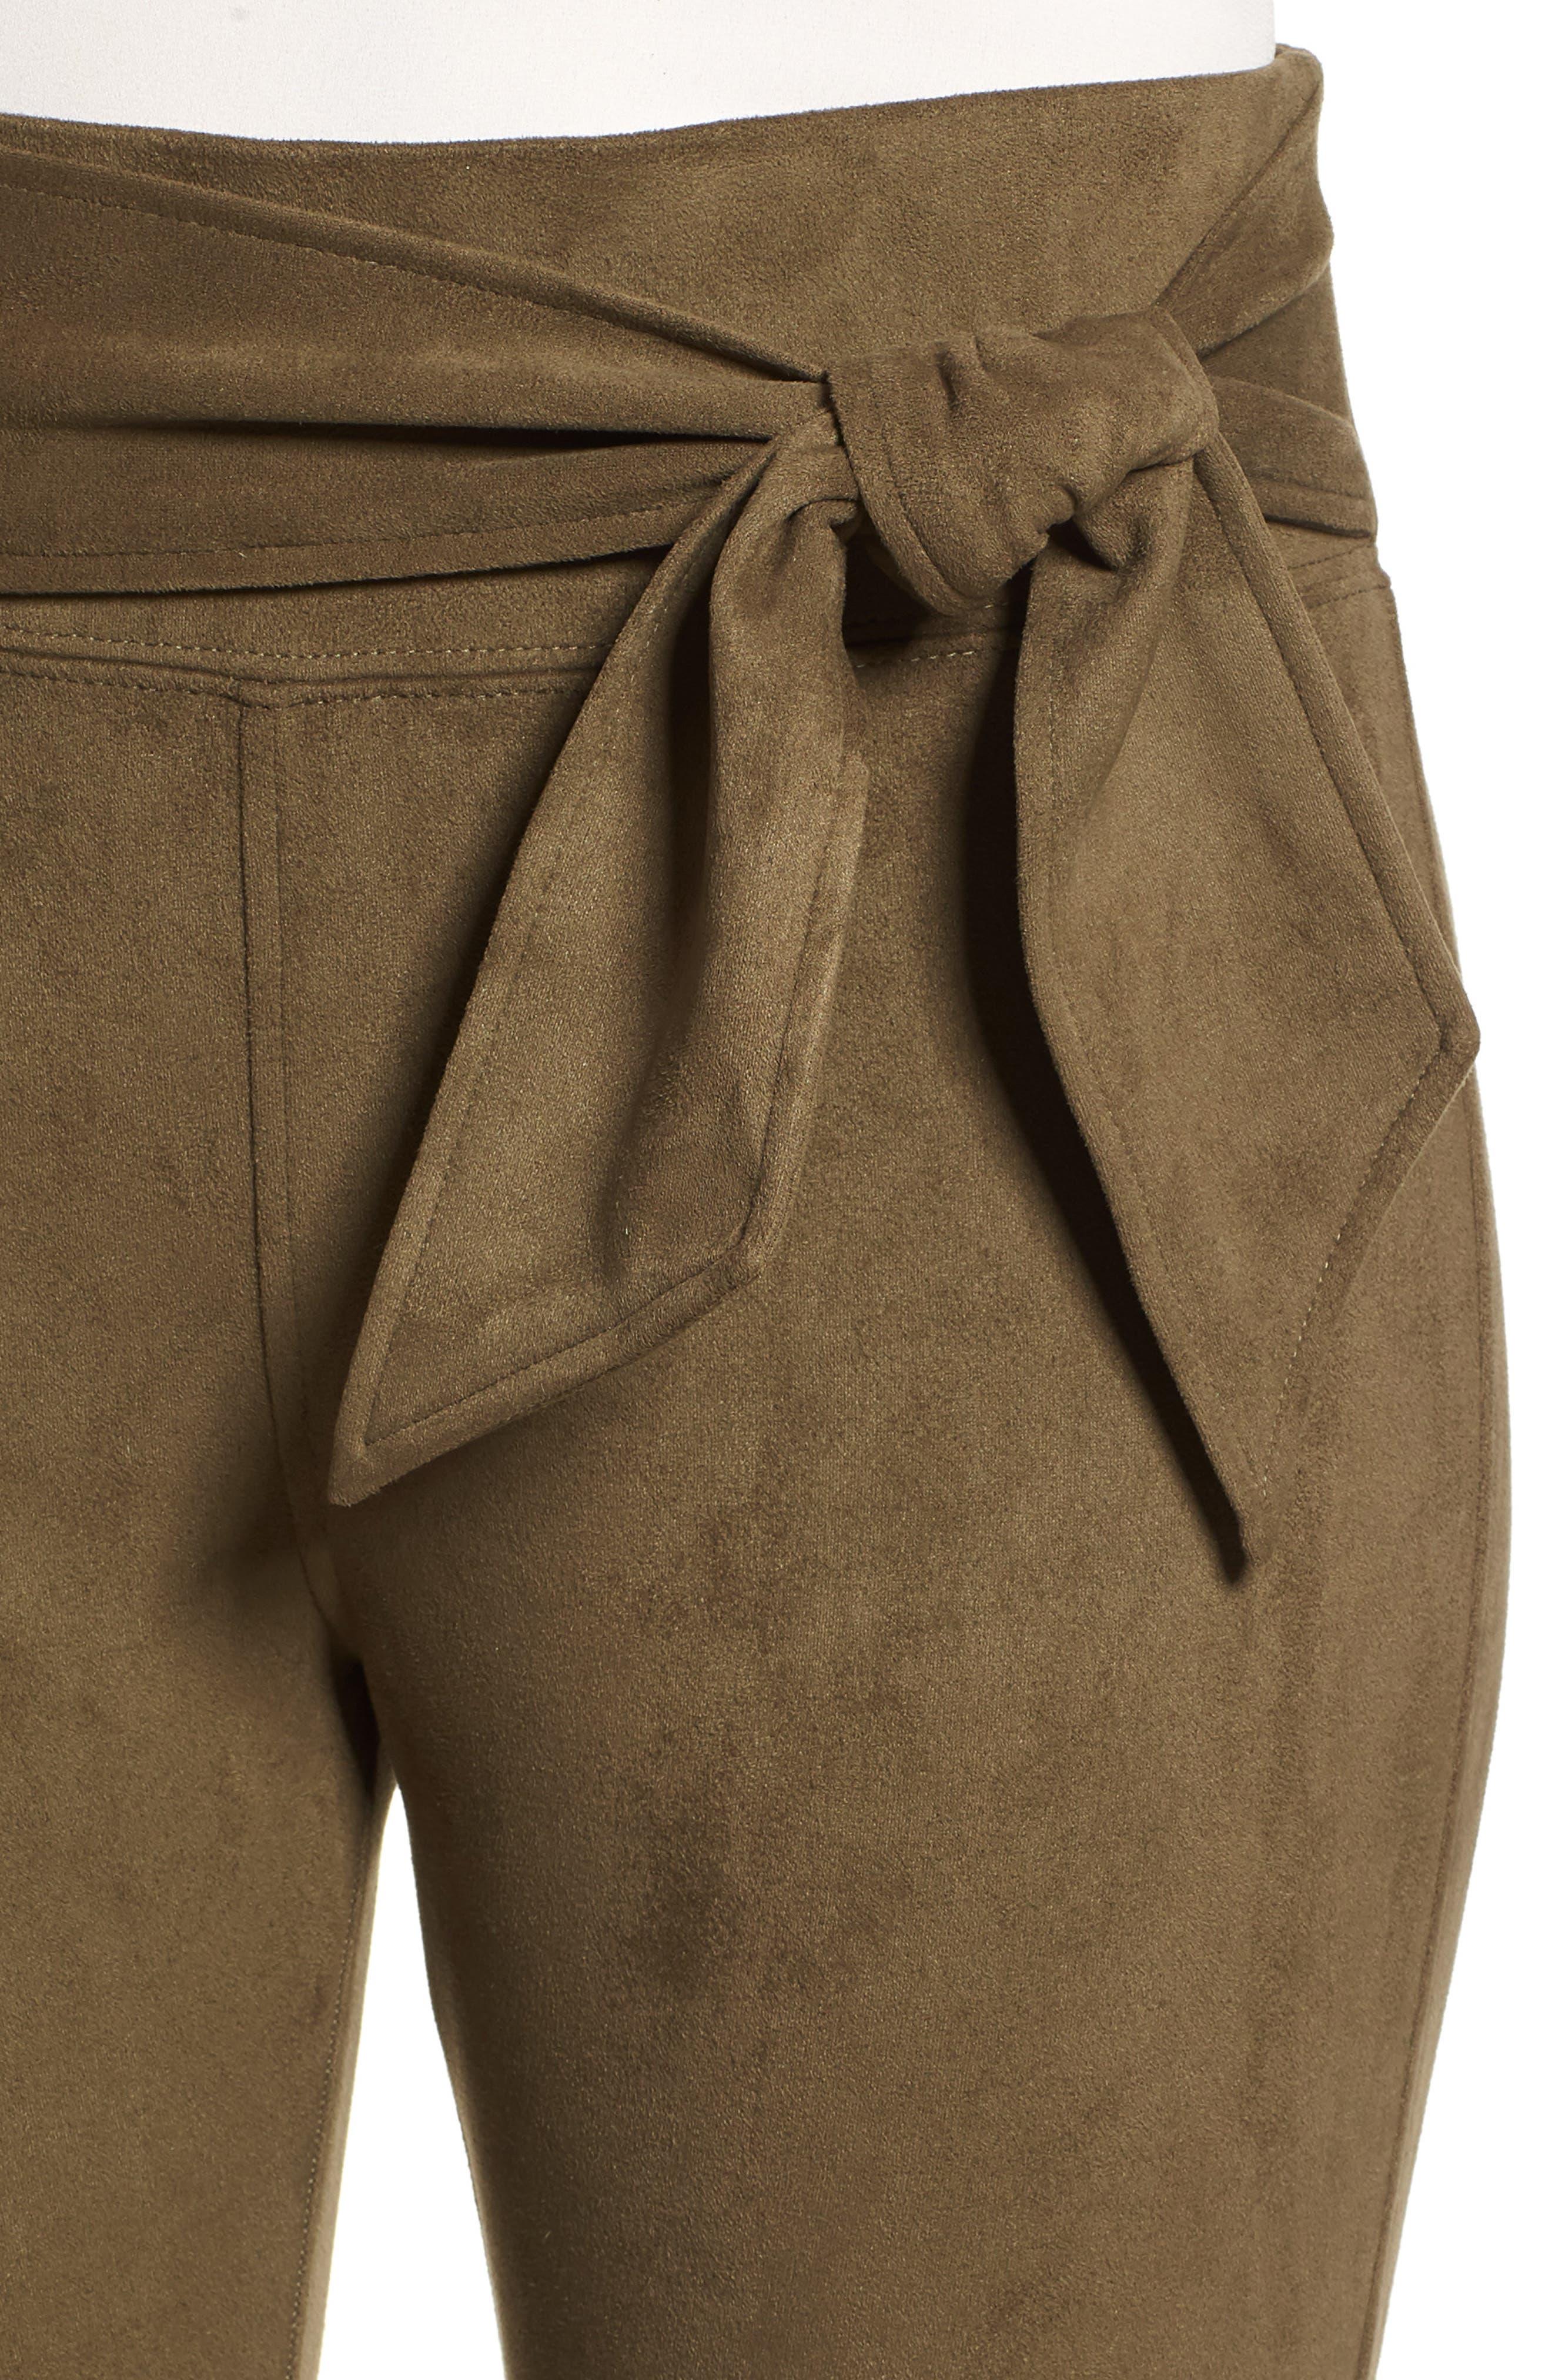 DAVID LERNER,                             Waist Tie Skimmer Leggings,                             Alternate thumbnail 4, color,                             ARMY GREEN